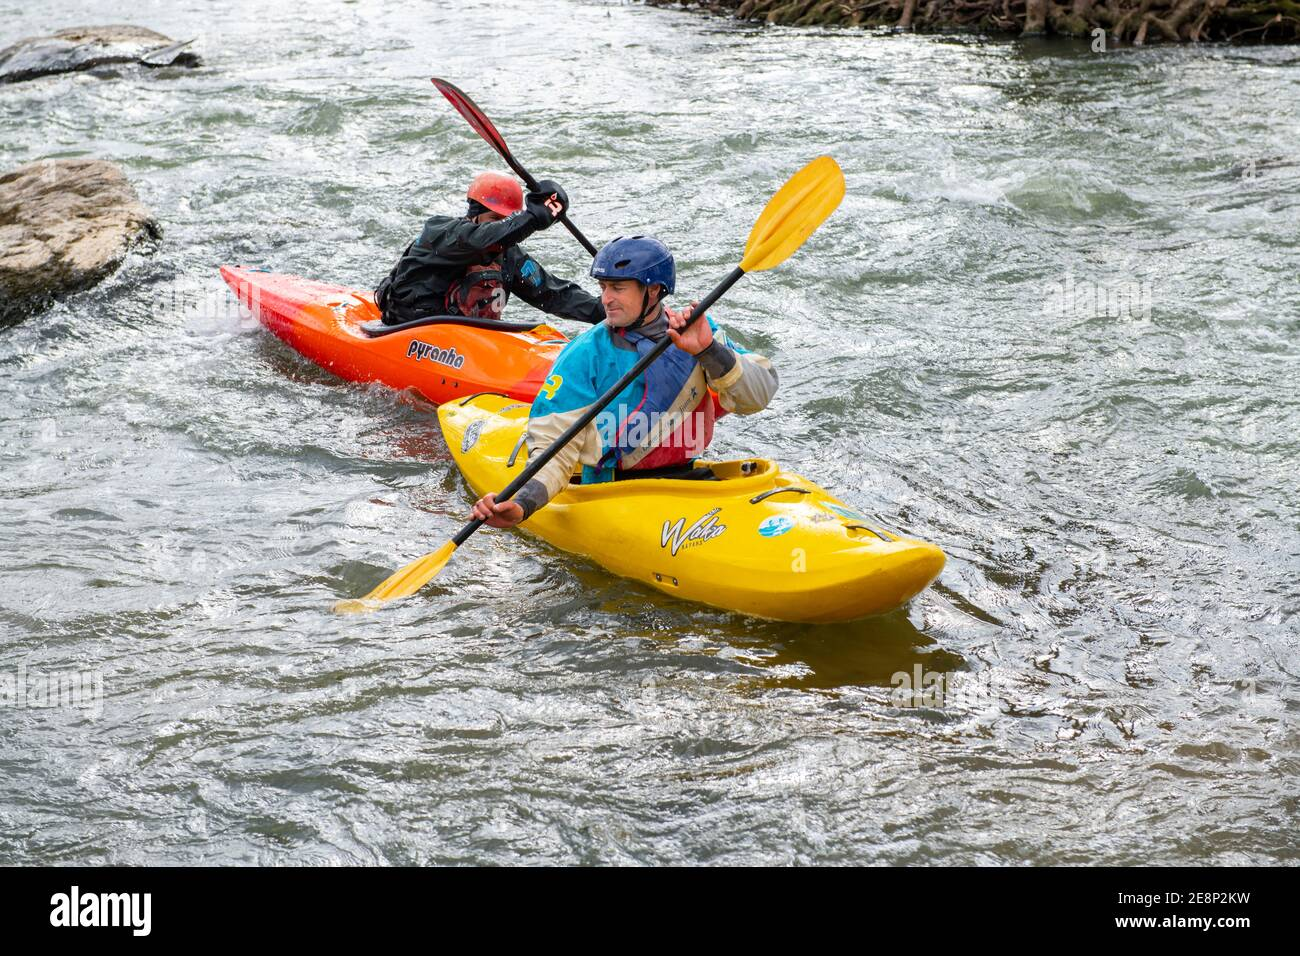 usa-maryland-md-kayaking-on-the-potomac-river-near-darnstown-men-winter-fun-2E8P2KW.jpg